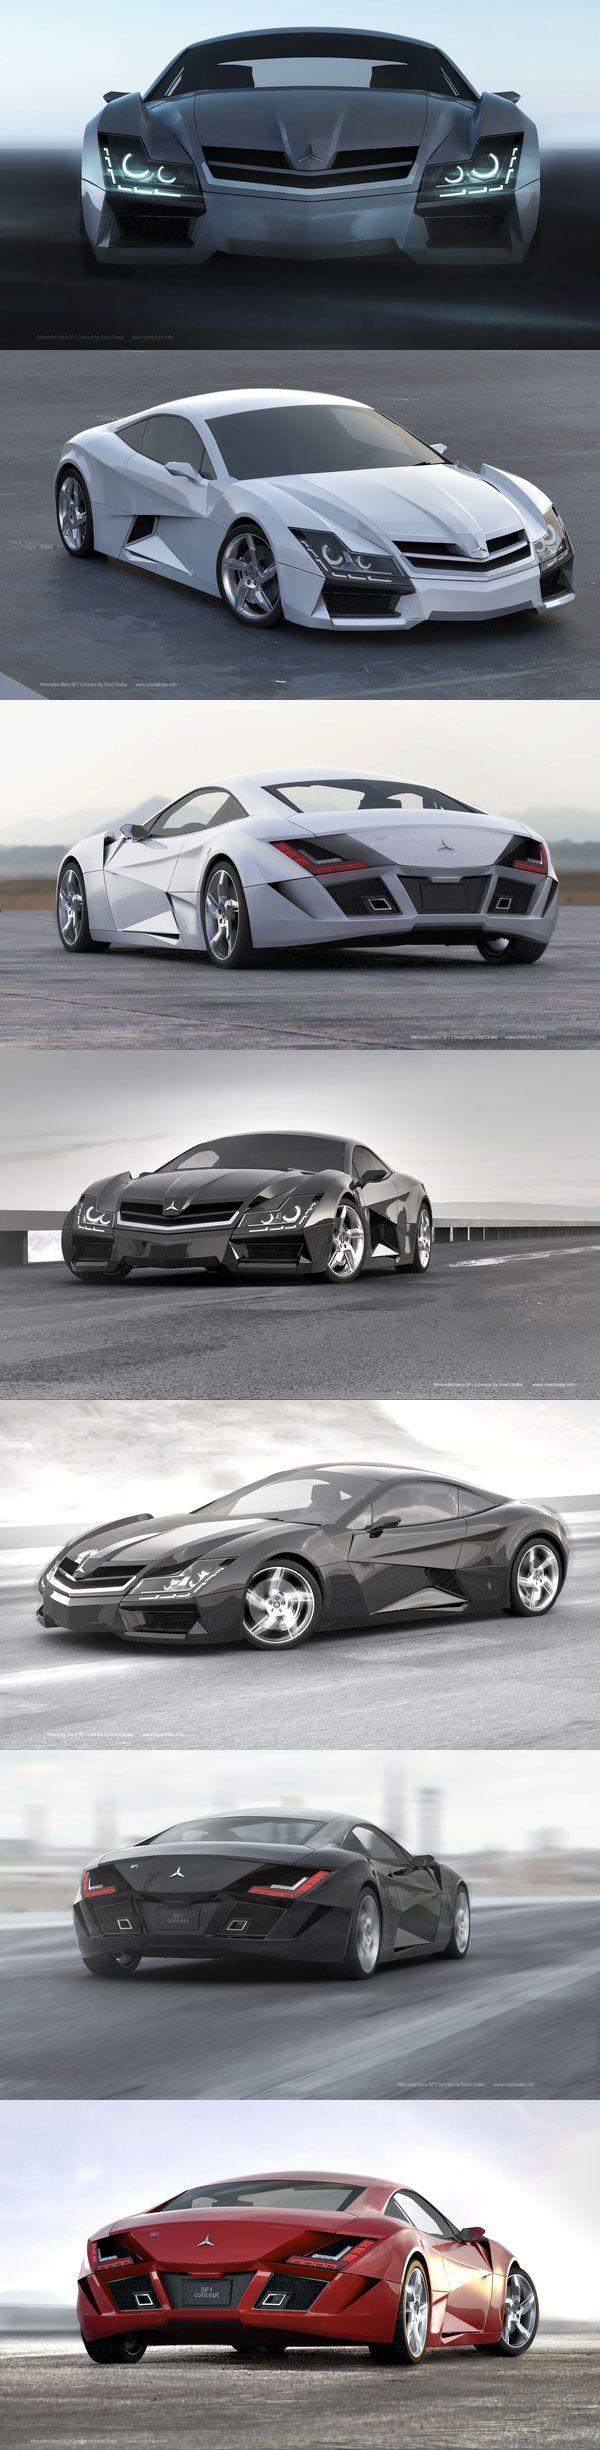 Ferrari F40 Redesigned As Stunning Modern Day Supercar Carbuzz Ferrari F40 Concept Cars Sports Cars